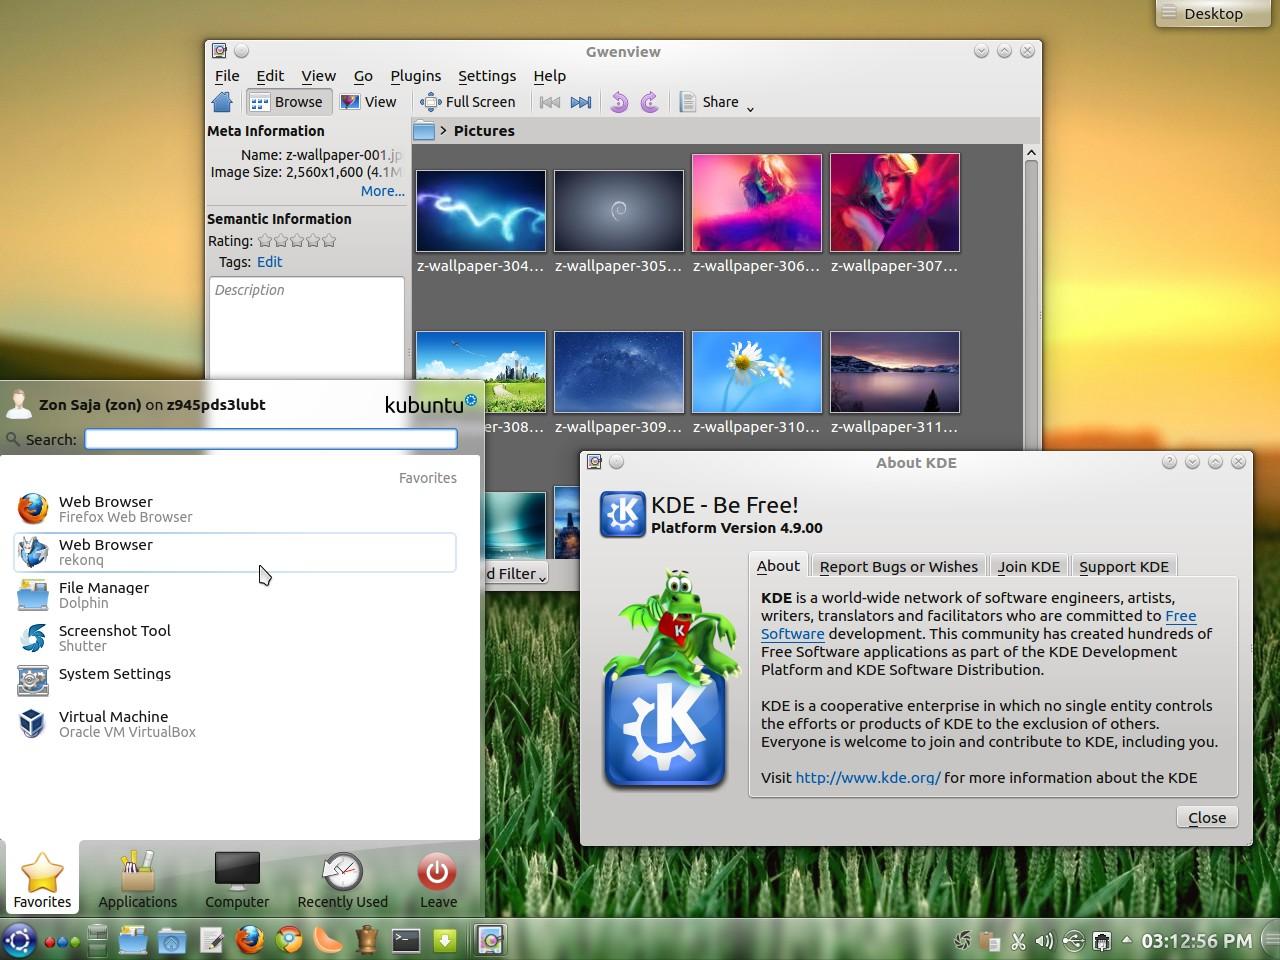 kde-4-9-kubuntu-12-04-screenshot-fandigital-01.jpg